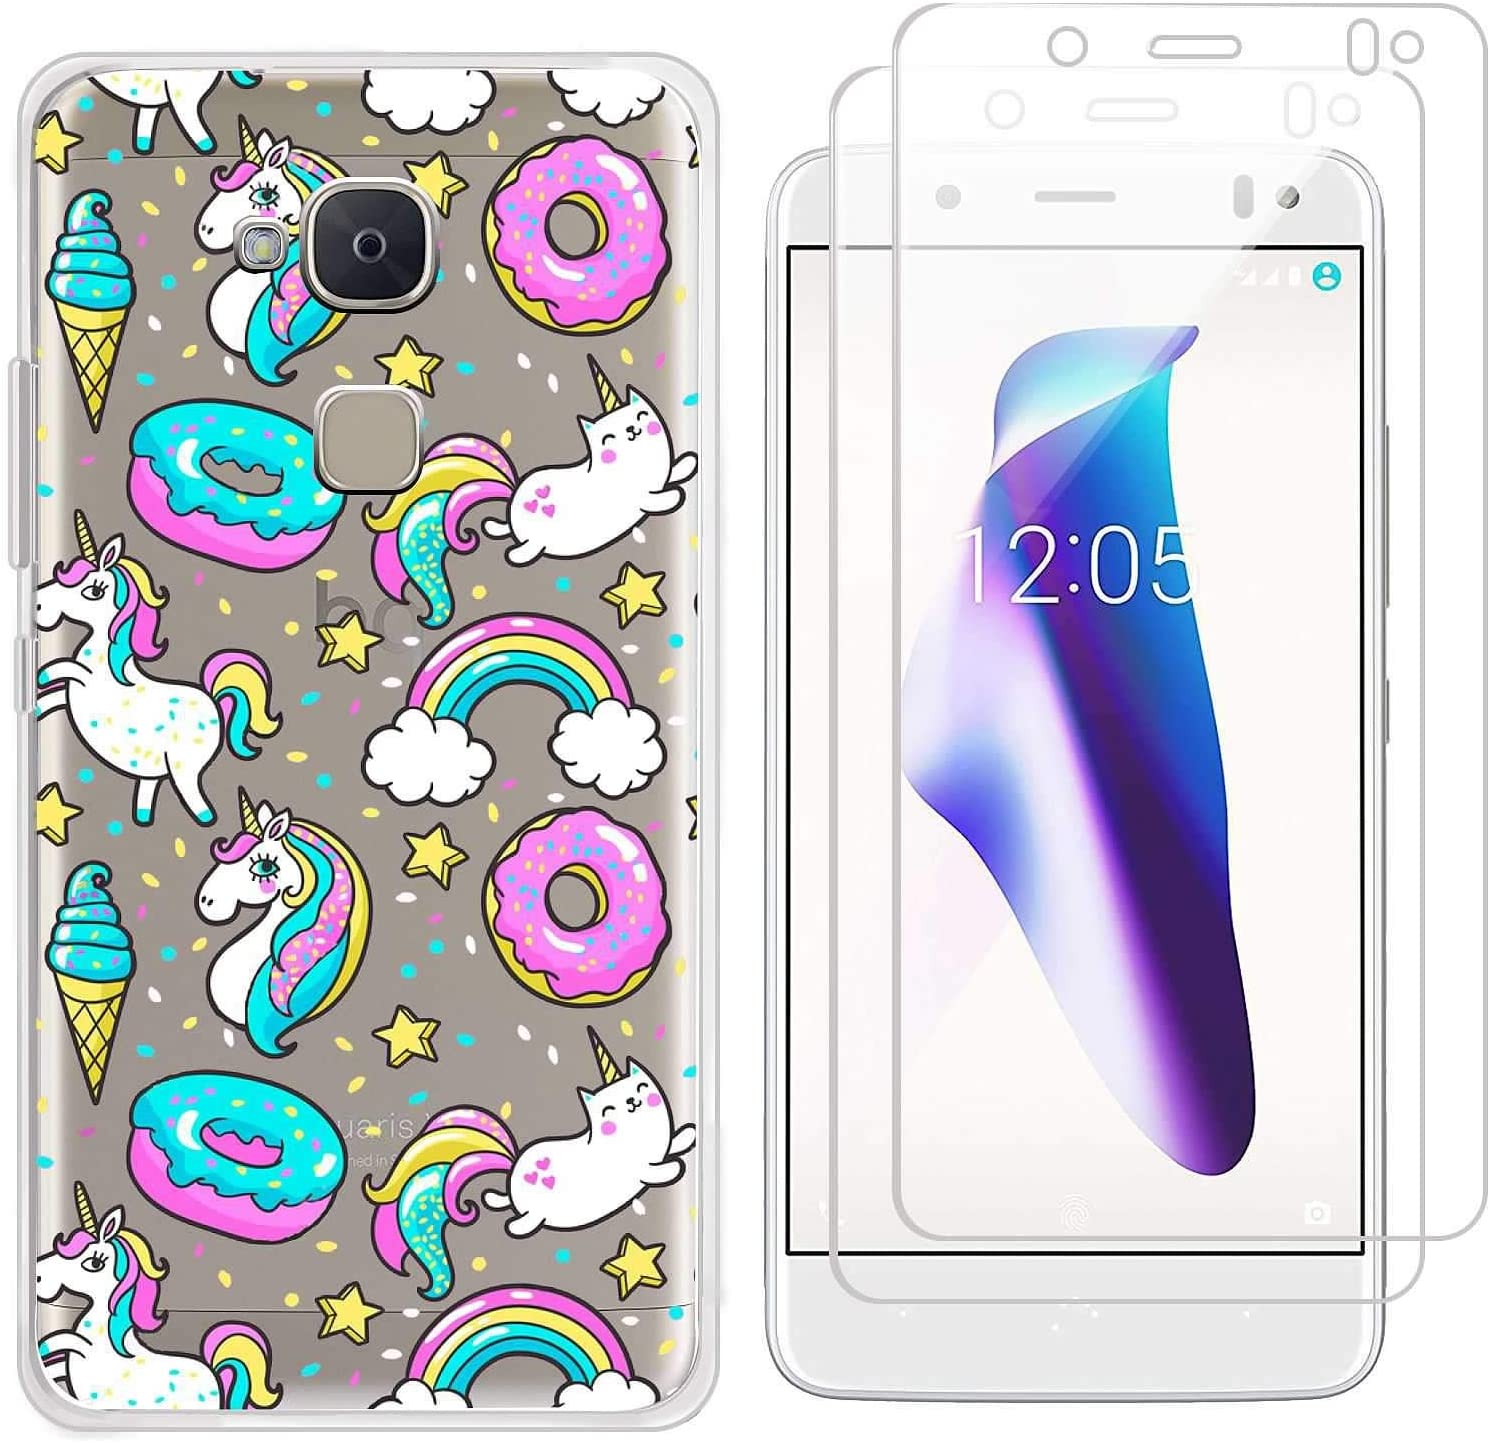 kaliter Funda BQ Aquaris V,Donut Unicorn Suave Transparente TPU Gel Silicona Protectora Smartphone Carcasa para BQ Aquaris V/VS con Dos Cristal Vidrio Templado Protector de Pantalla: Amazon.es: Electrónica